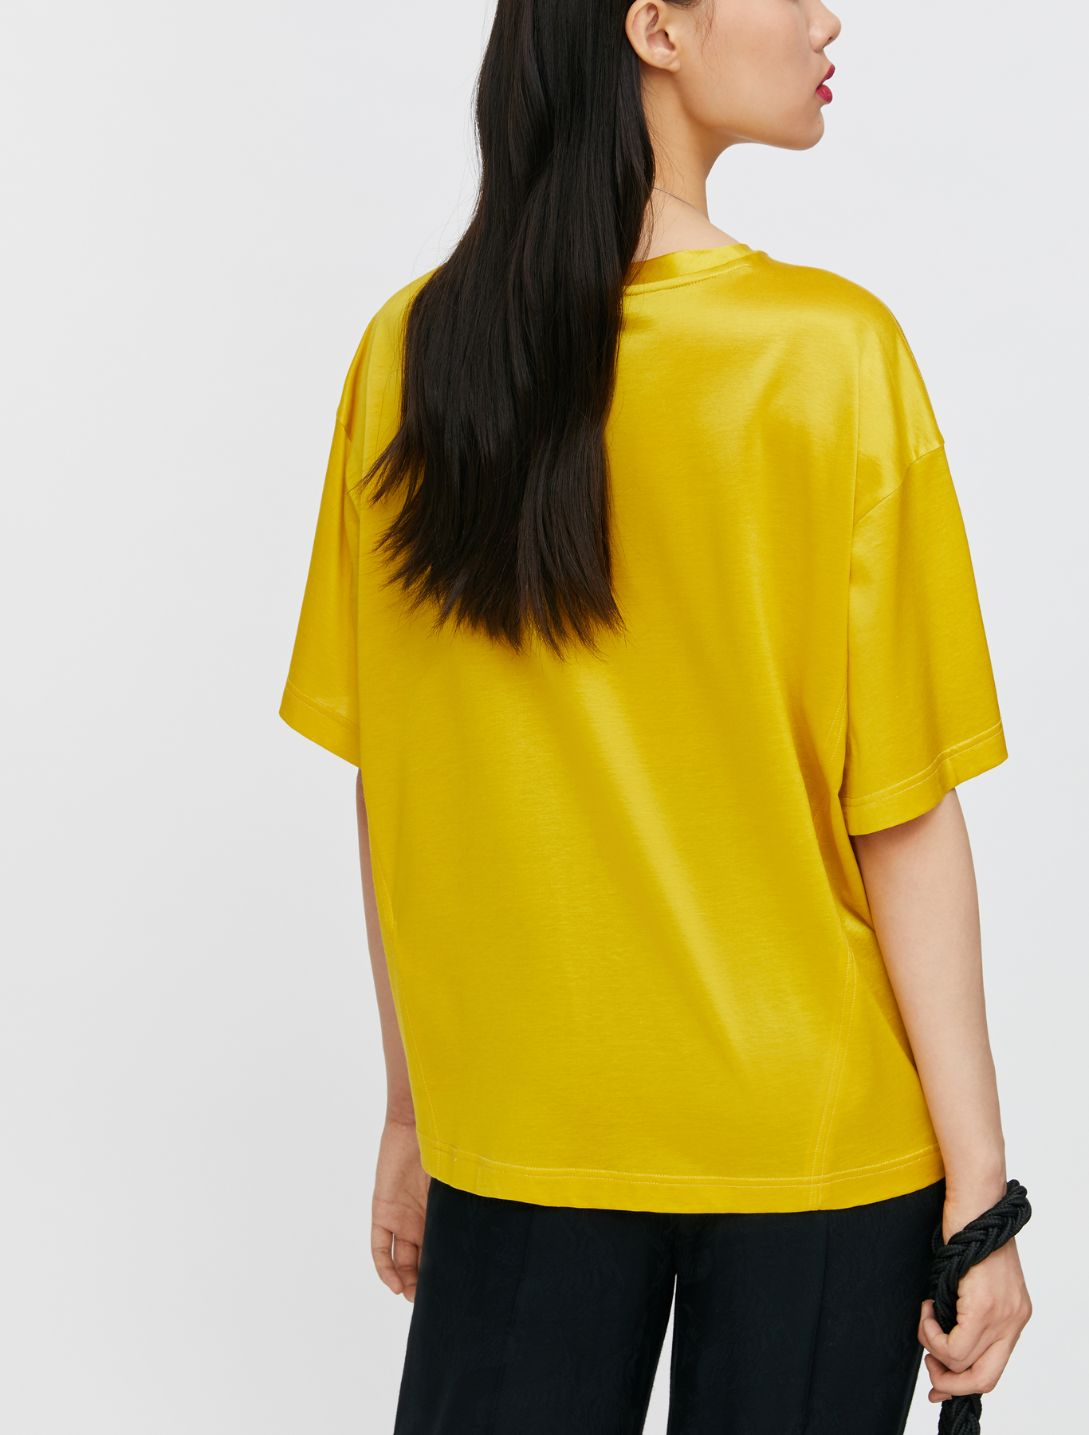 DARIA T-shirt mustard 2